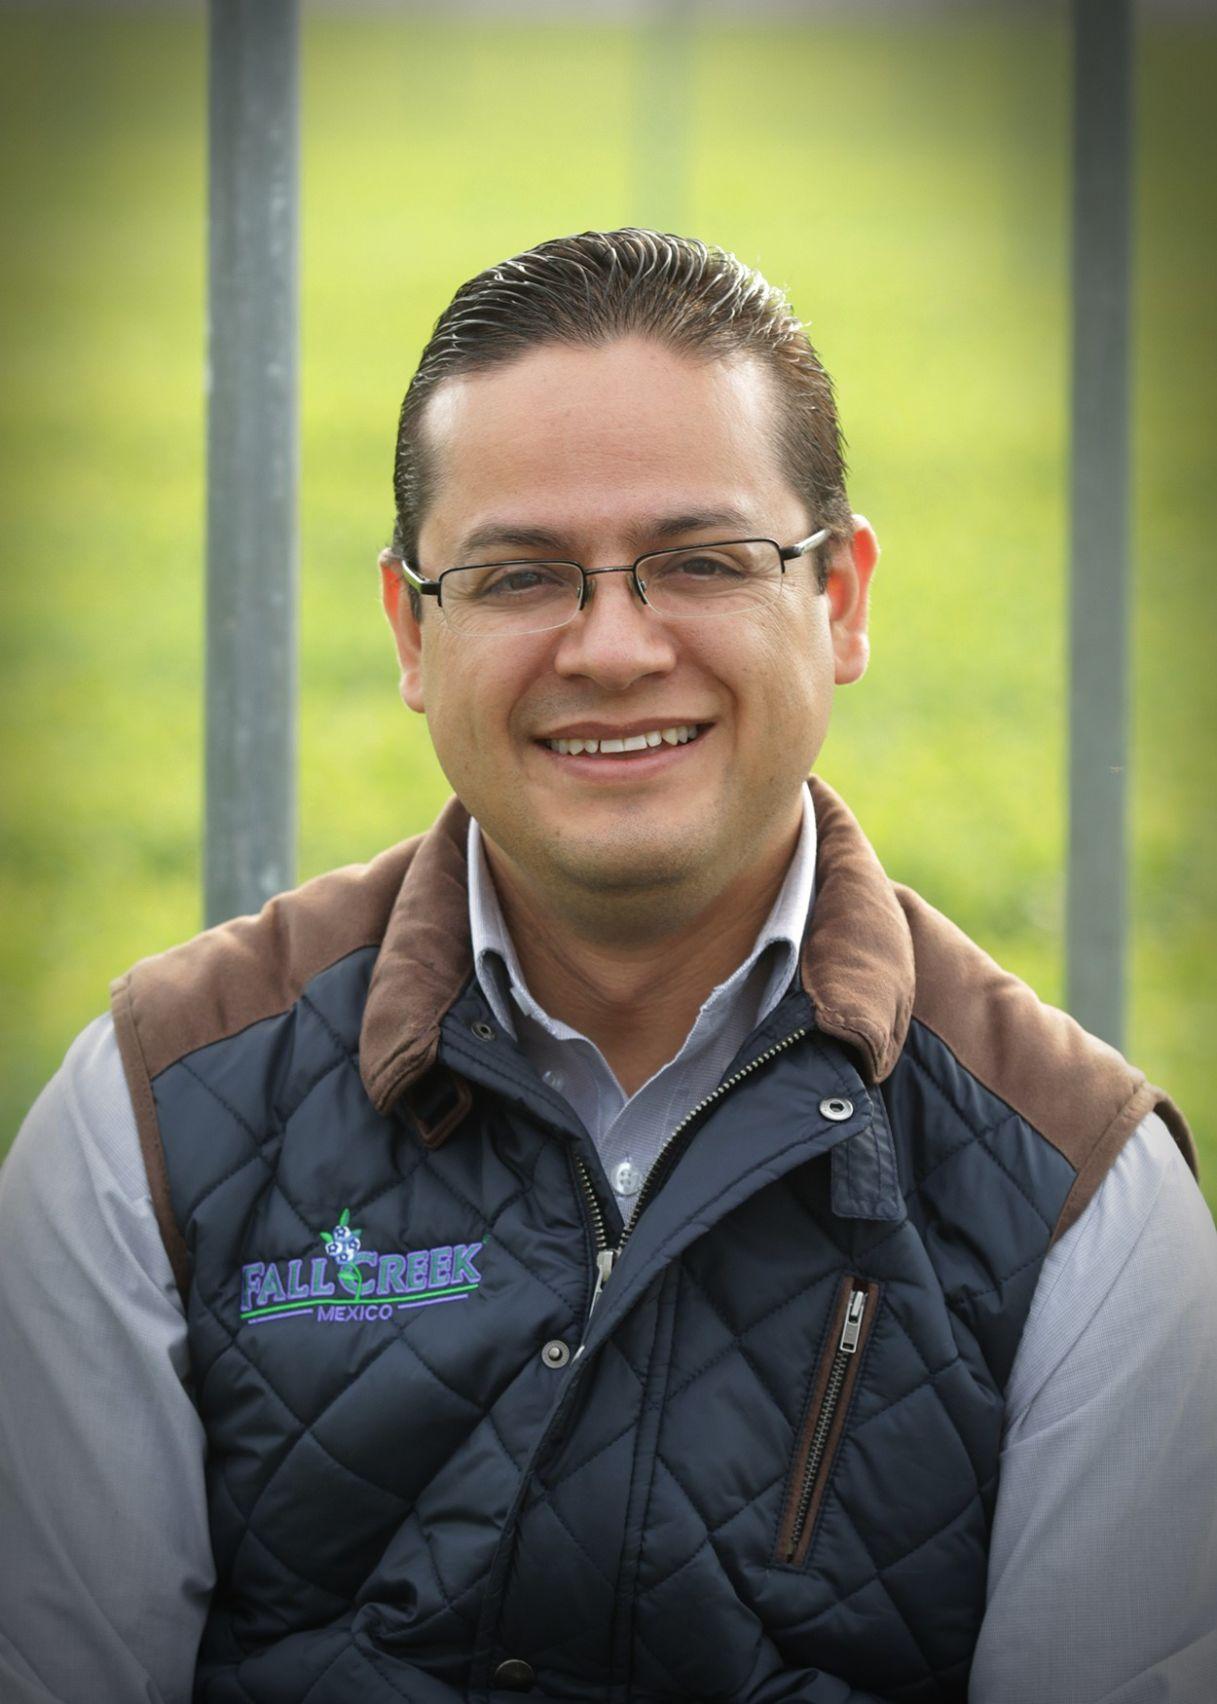 Ricardo Marquez Reyes